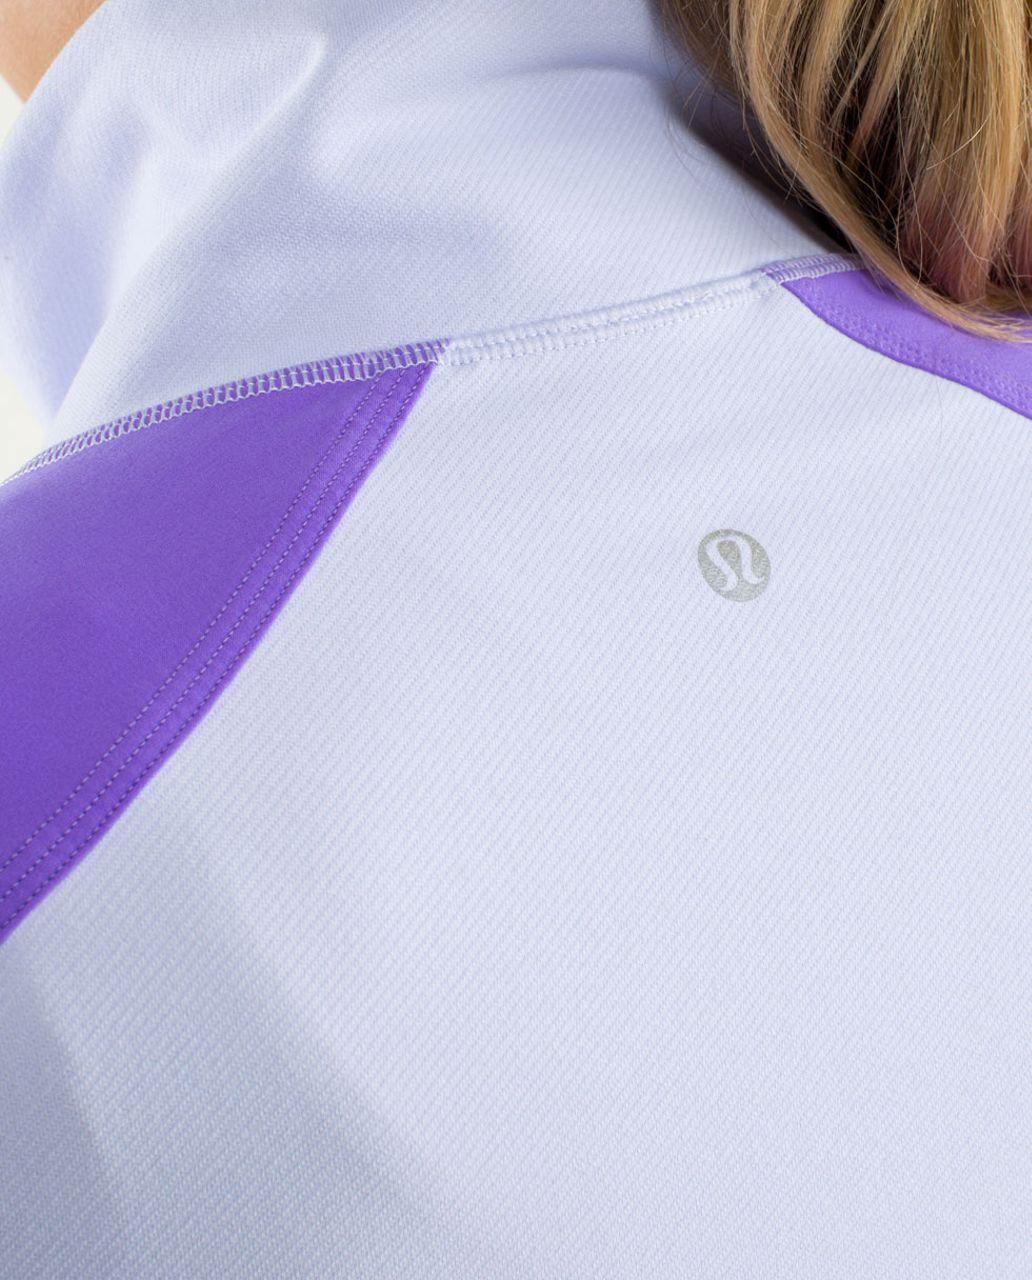 Lululemon Contempo Jacket - Cool Breeze / Power Purple